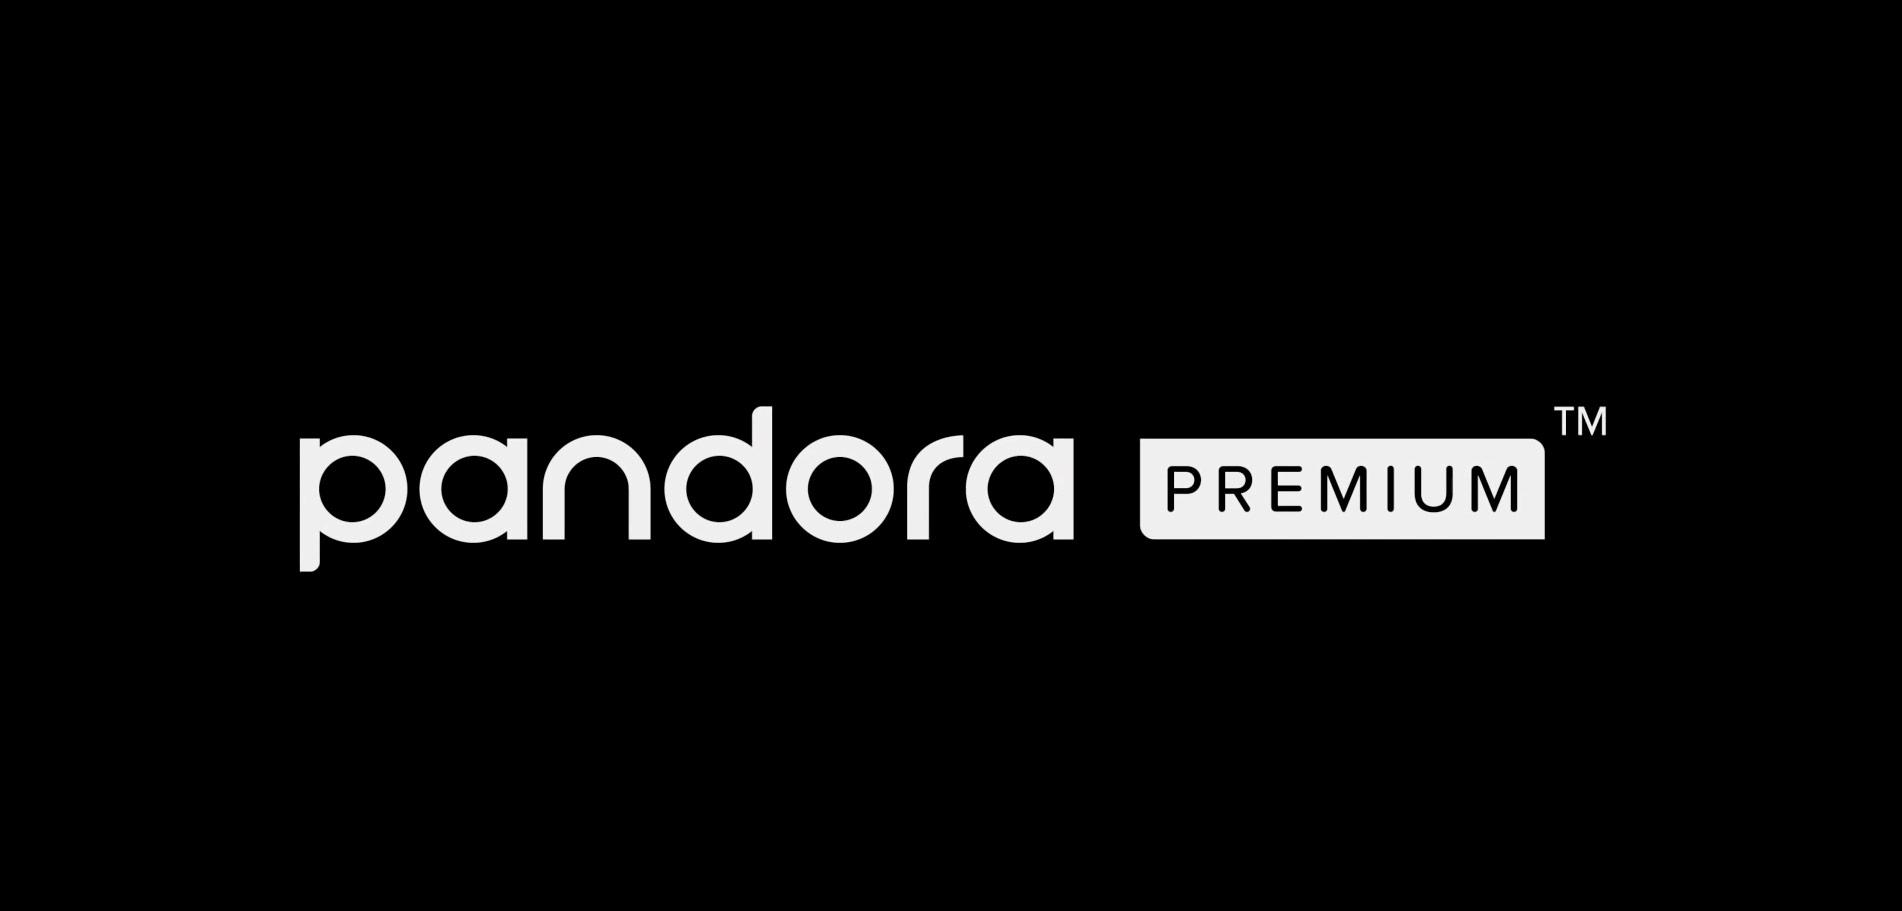 2017 Streaming Music Guide: Pandora Premium